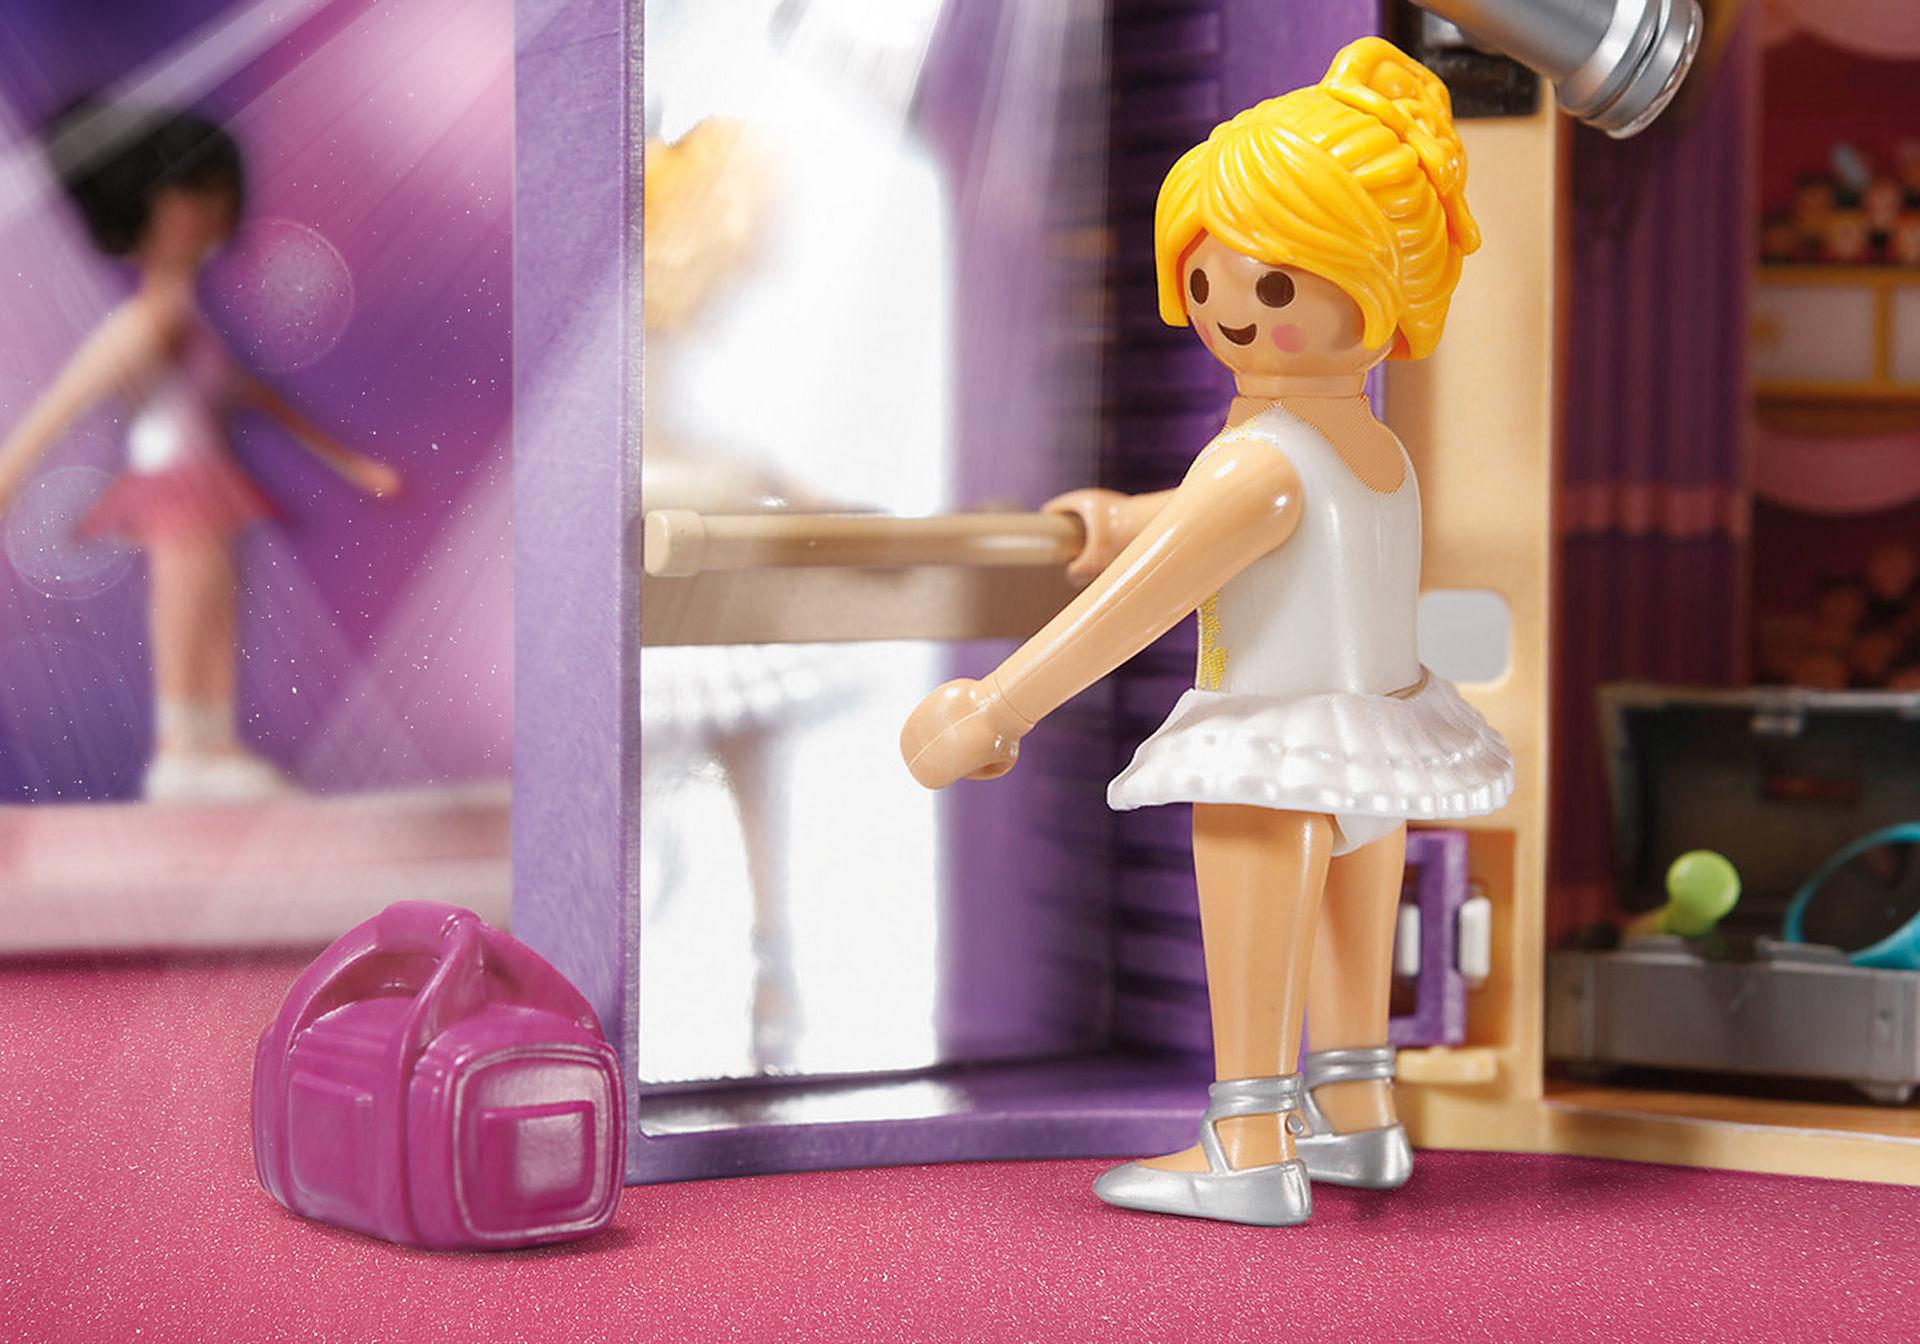 70316 Dance Studio Play Box zoom image5